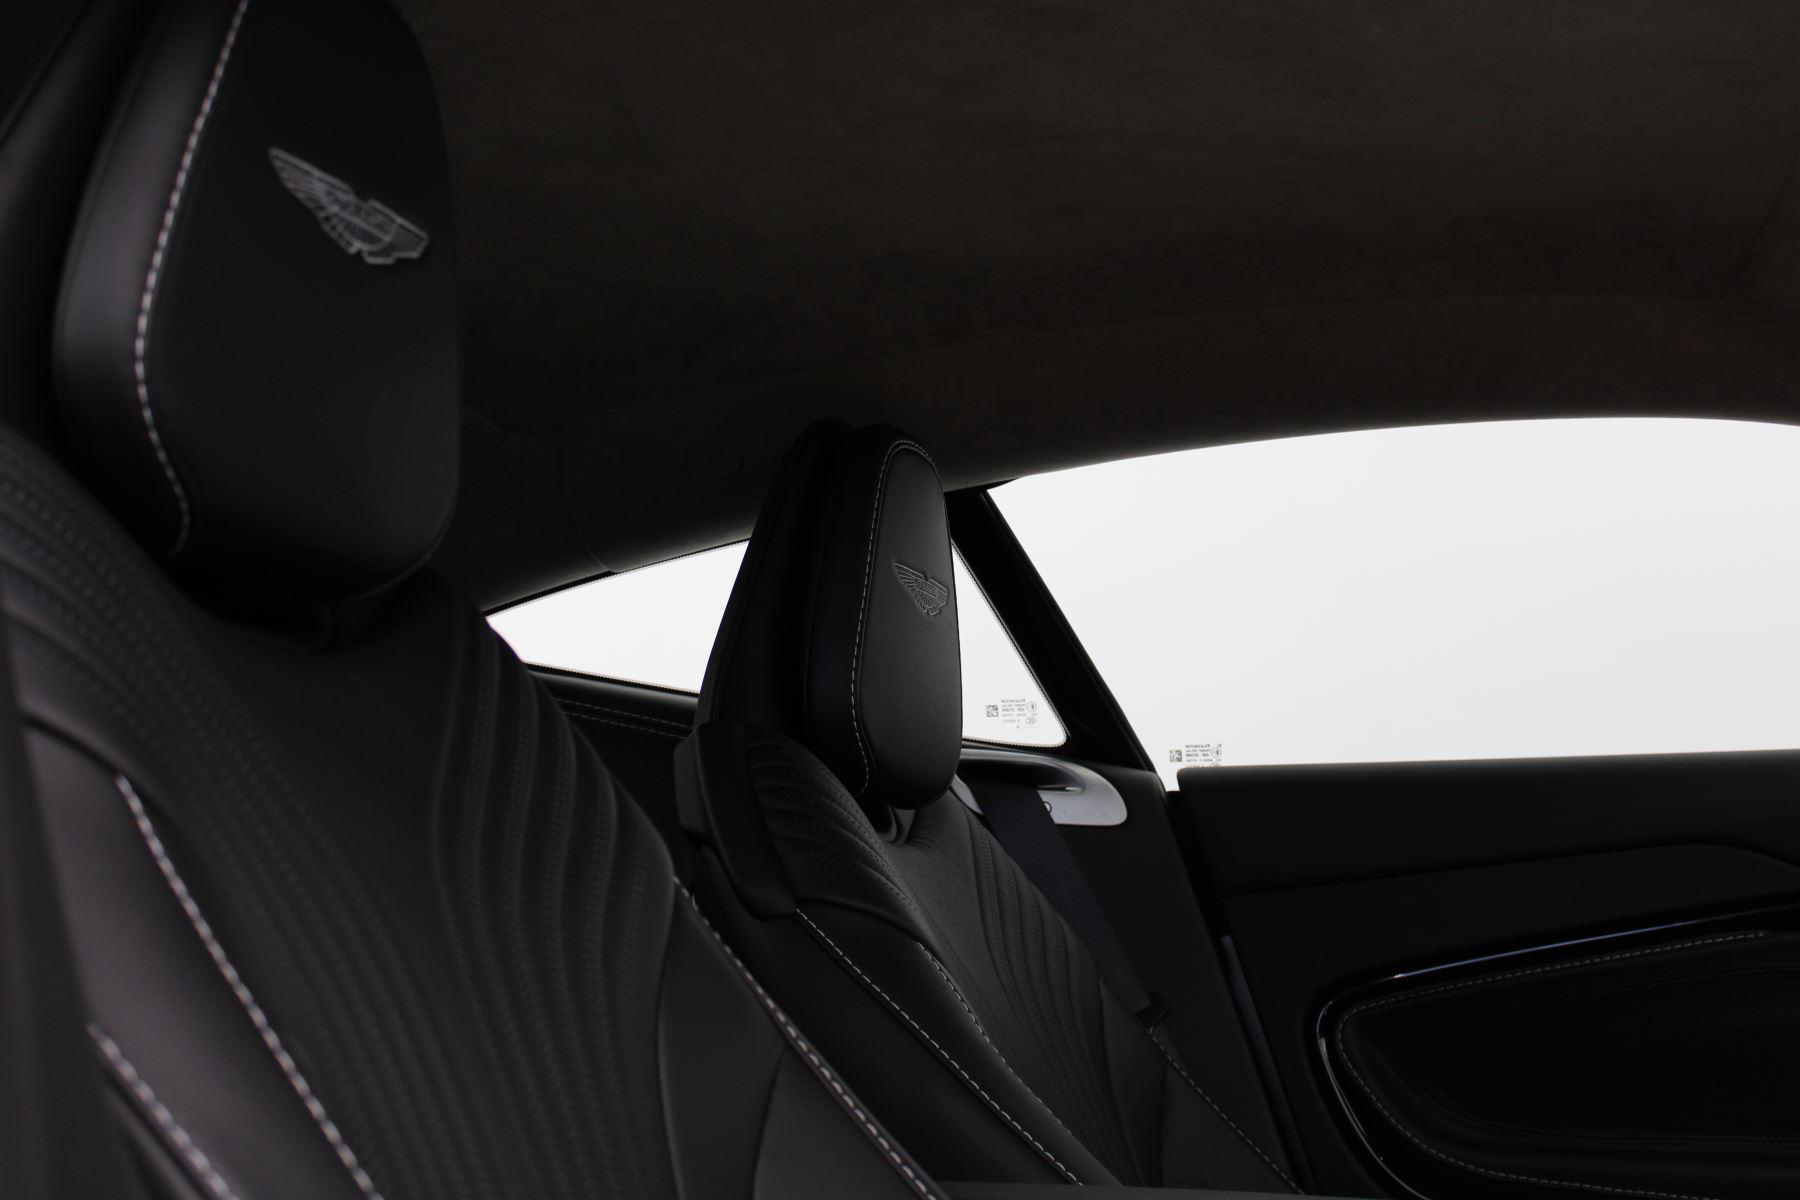 Aston Martin DB11 V8 2dr Touchtronic Auto image 14